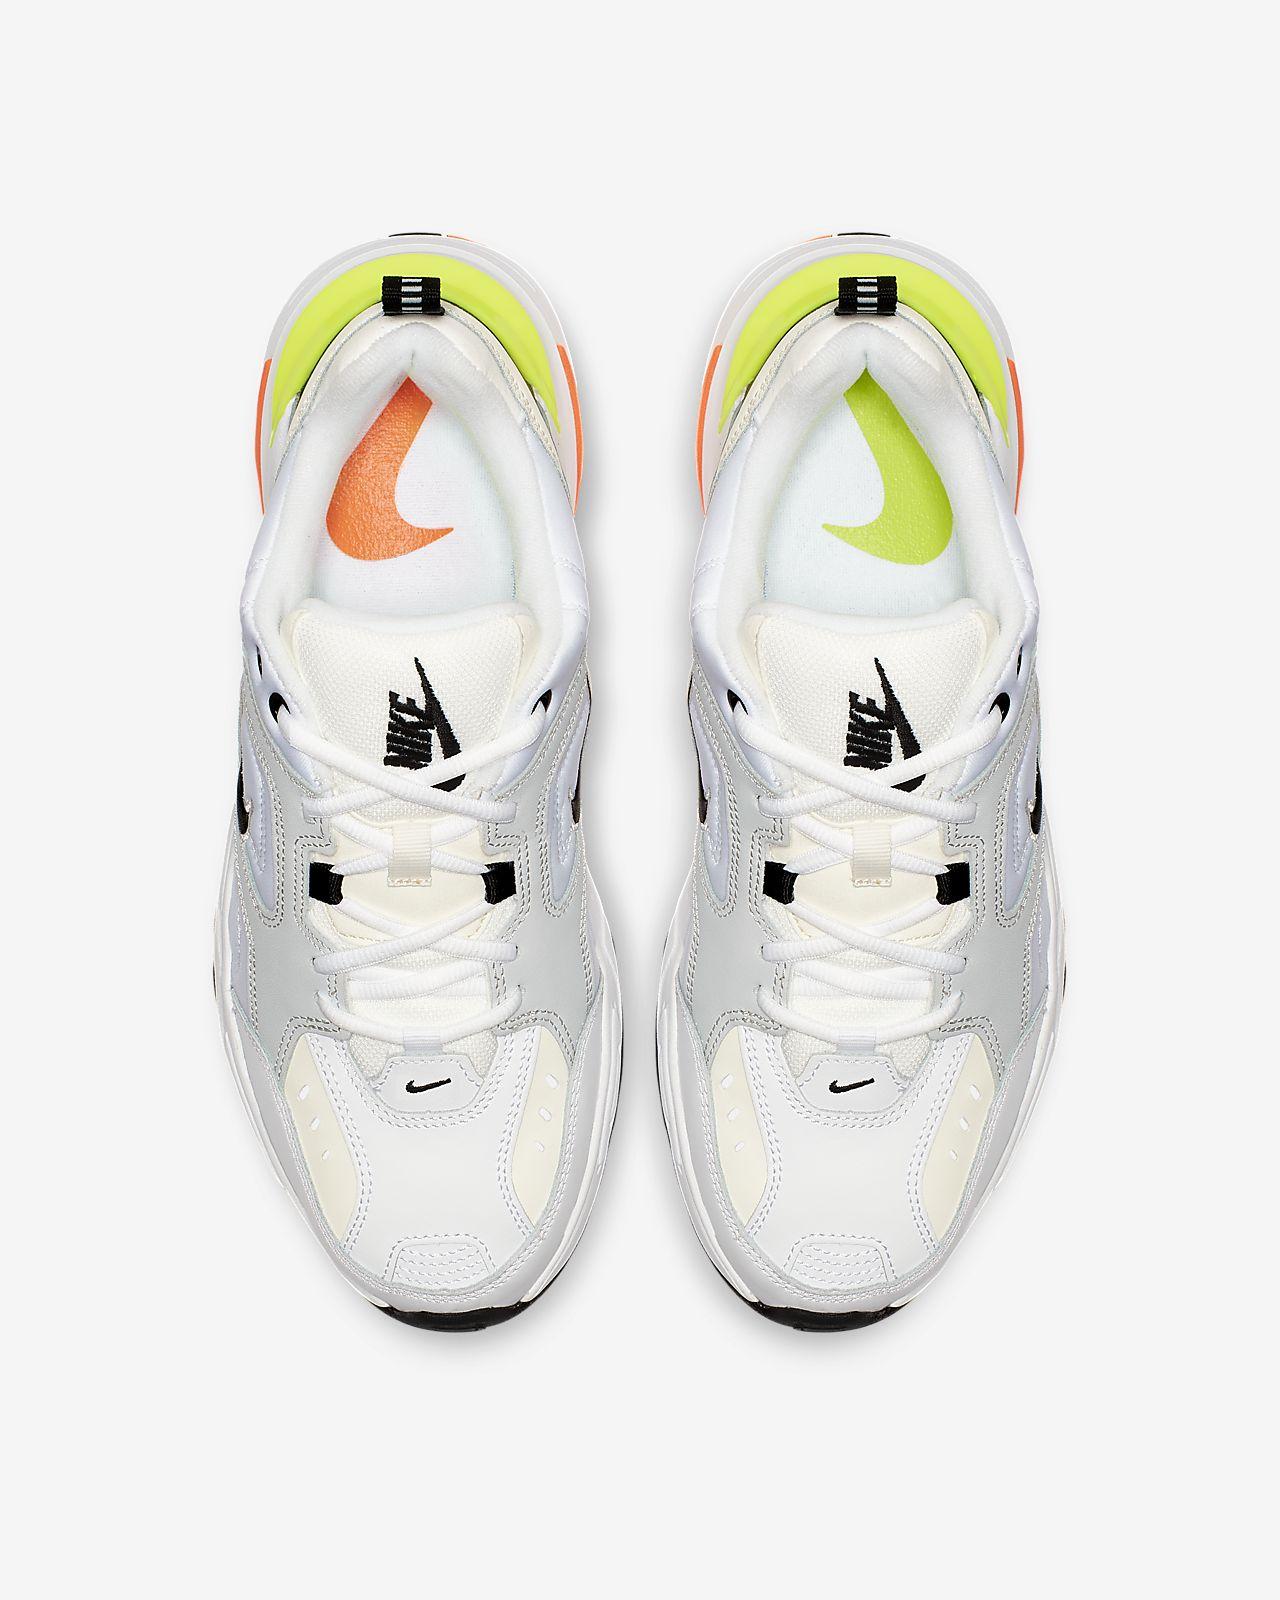 release date ed9a0 6b5f5 ... Nike M2K Tekno Men s Shoe